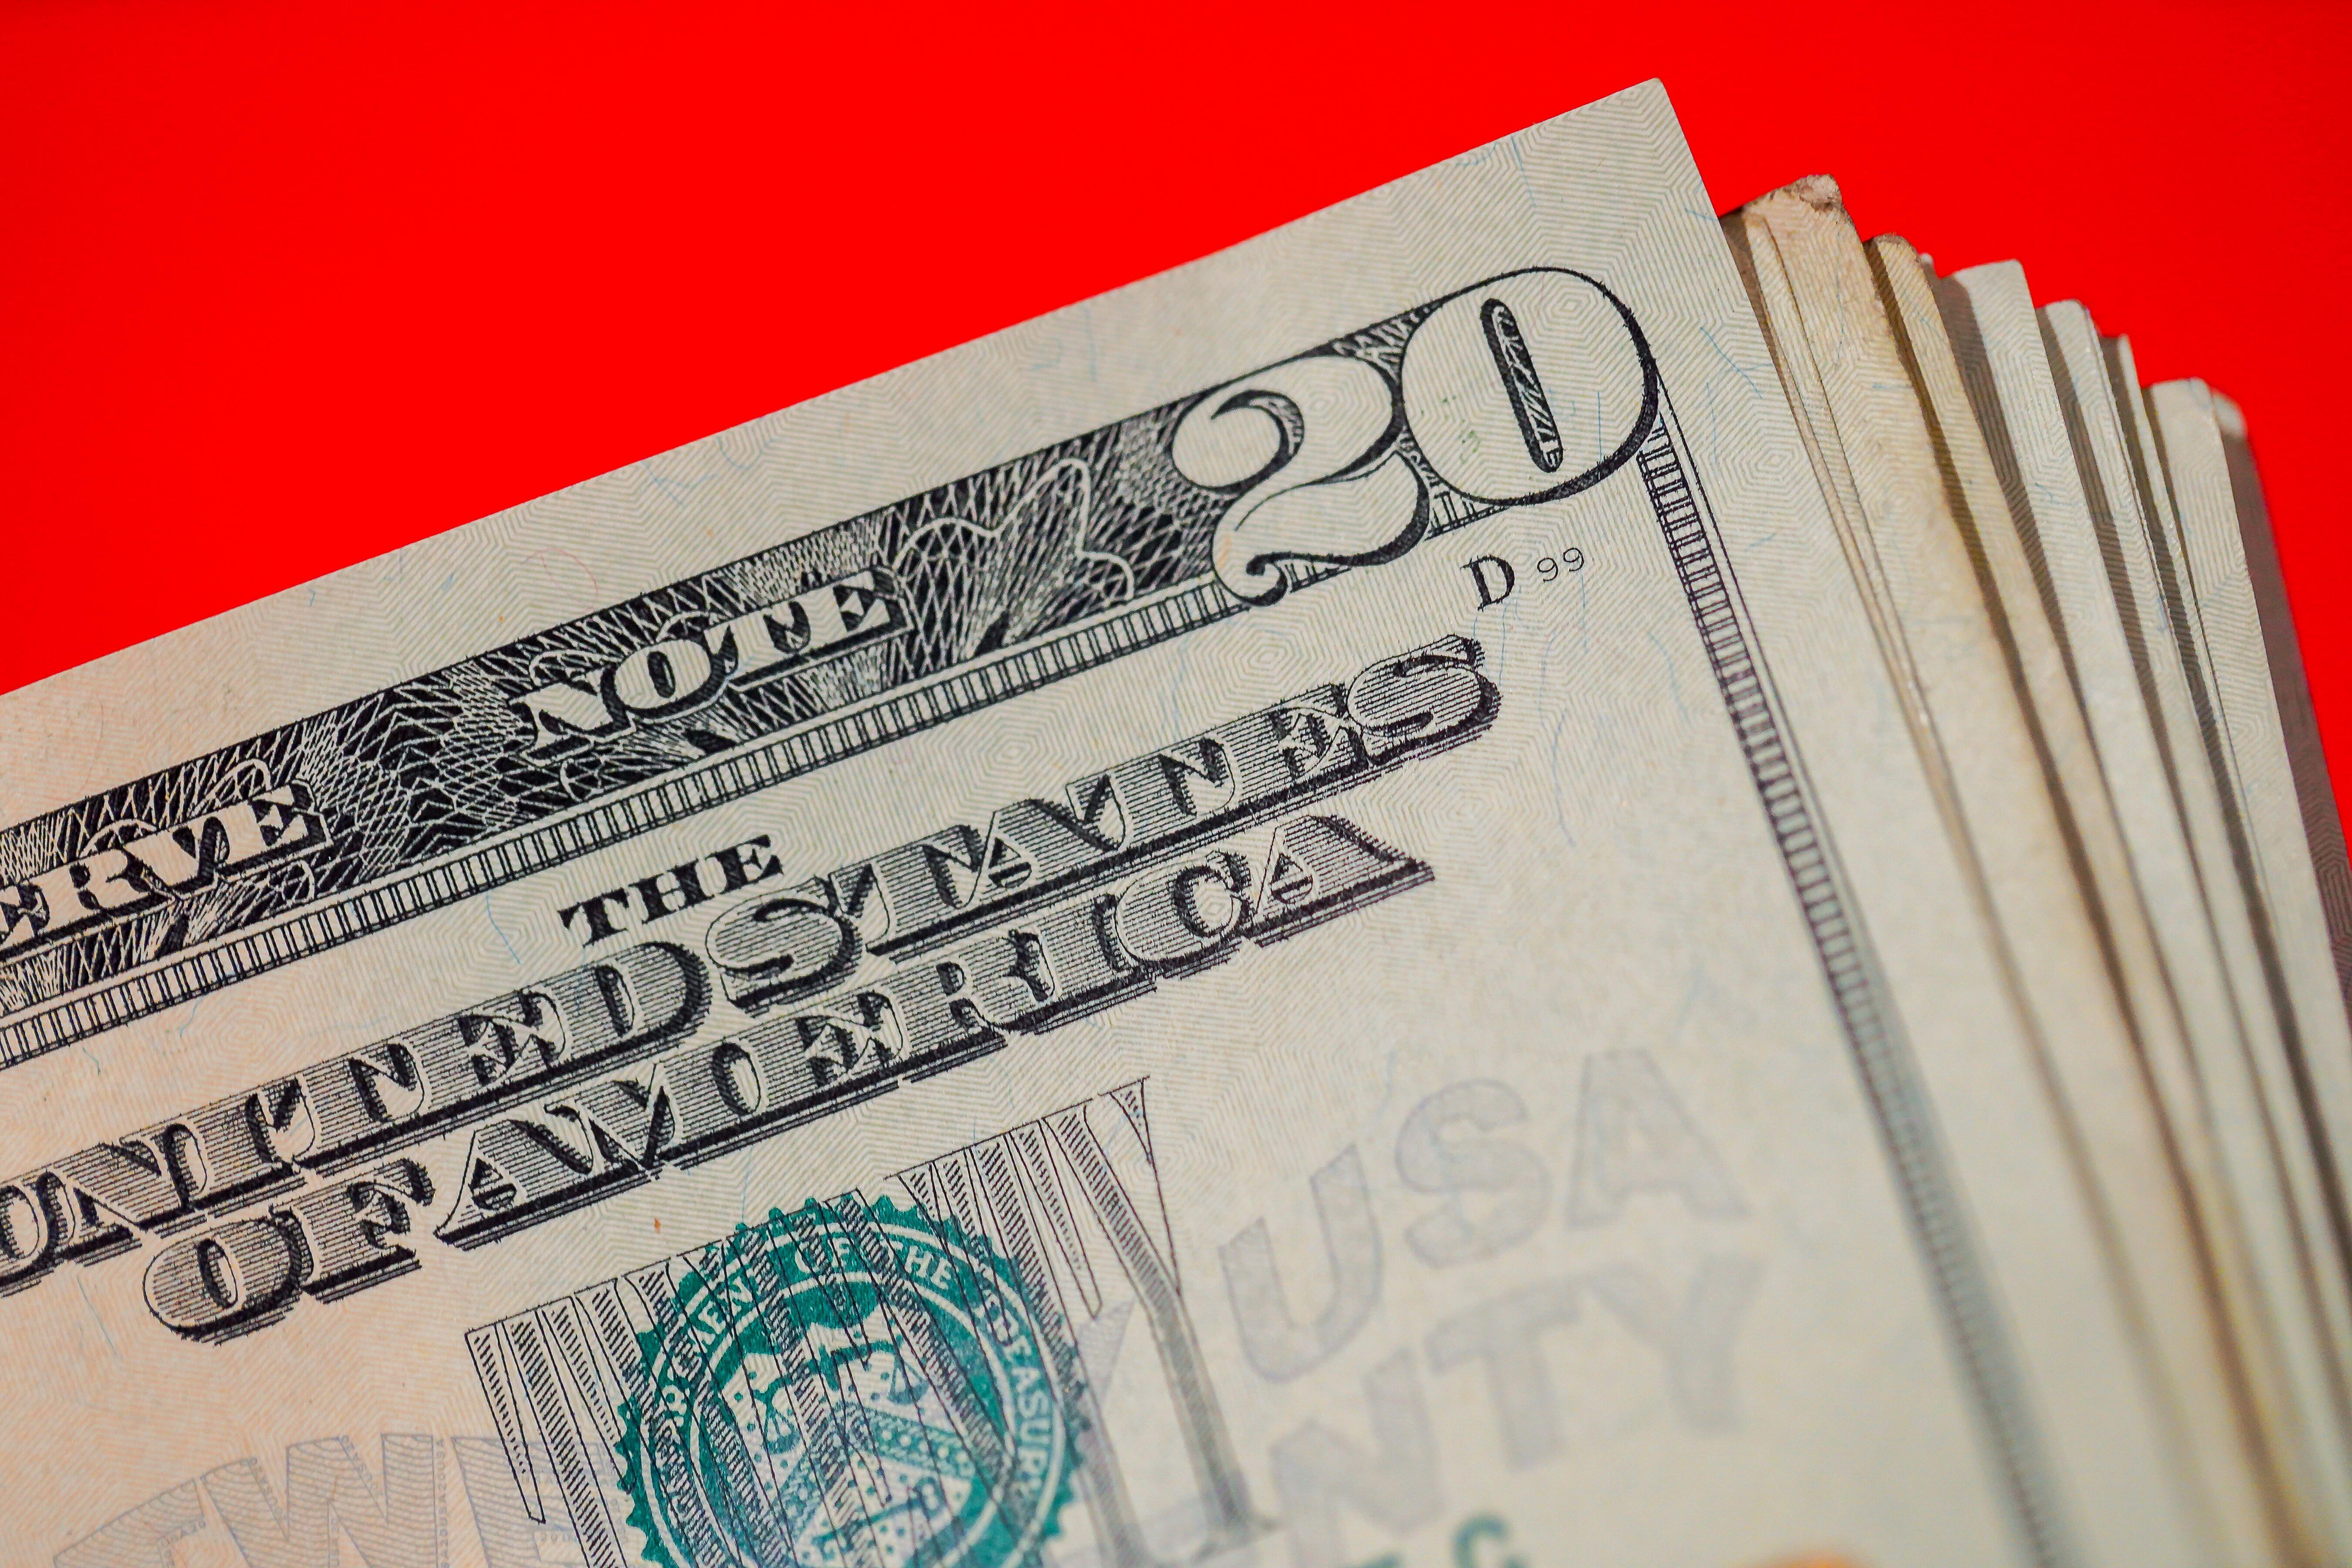 money-bills-wallet-coins-dollars-1009